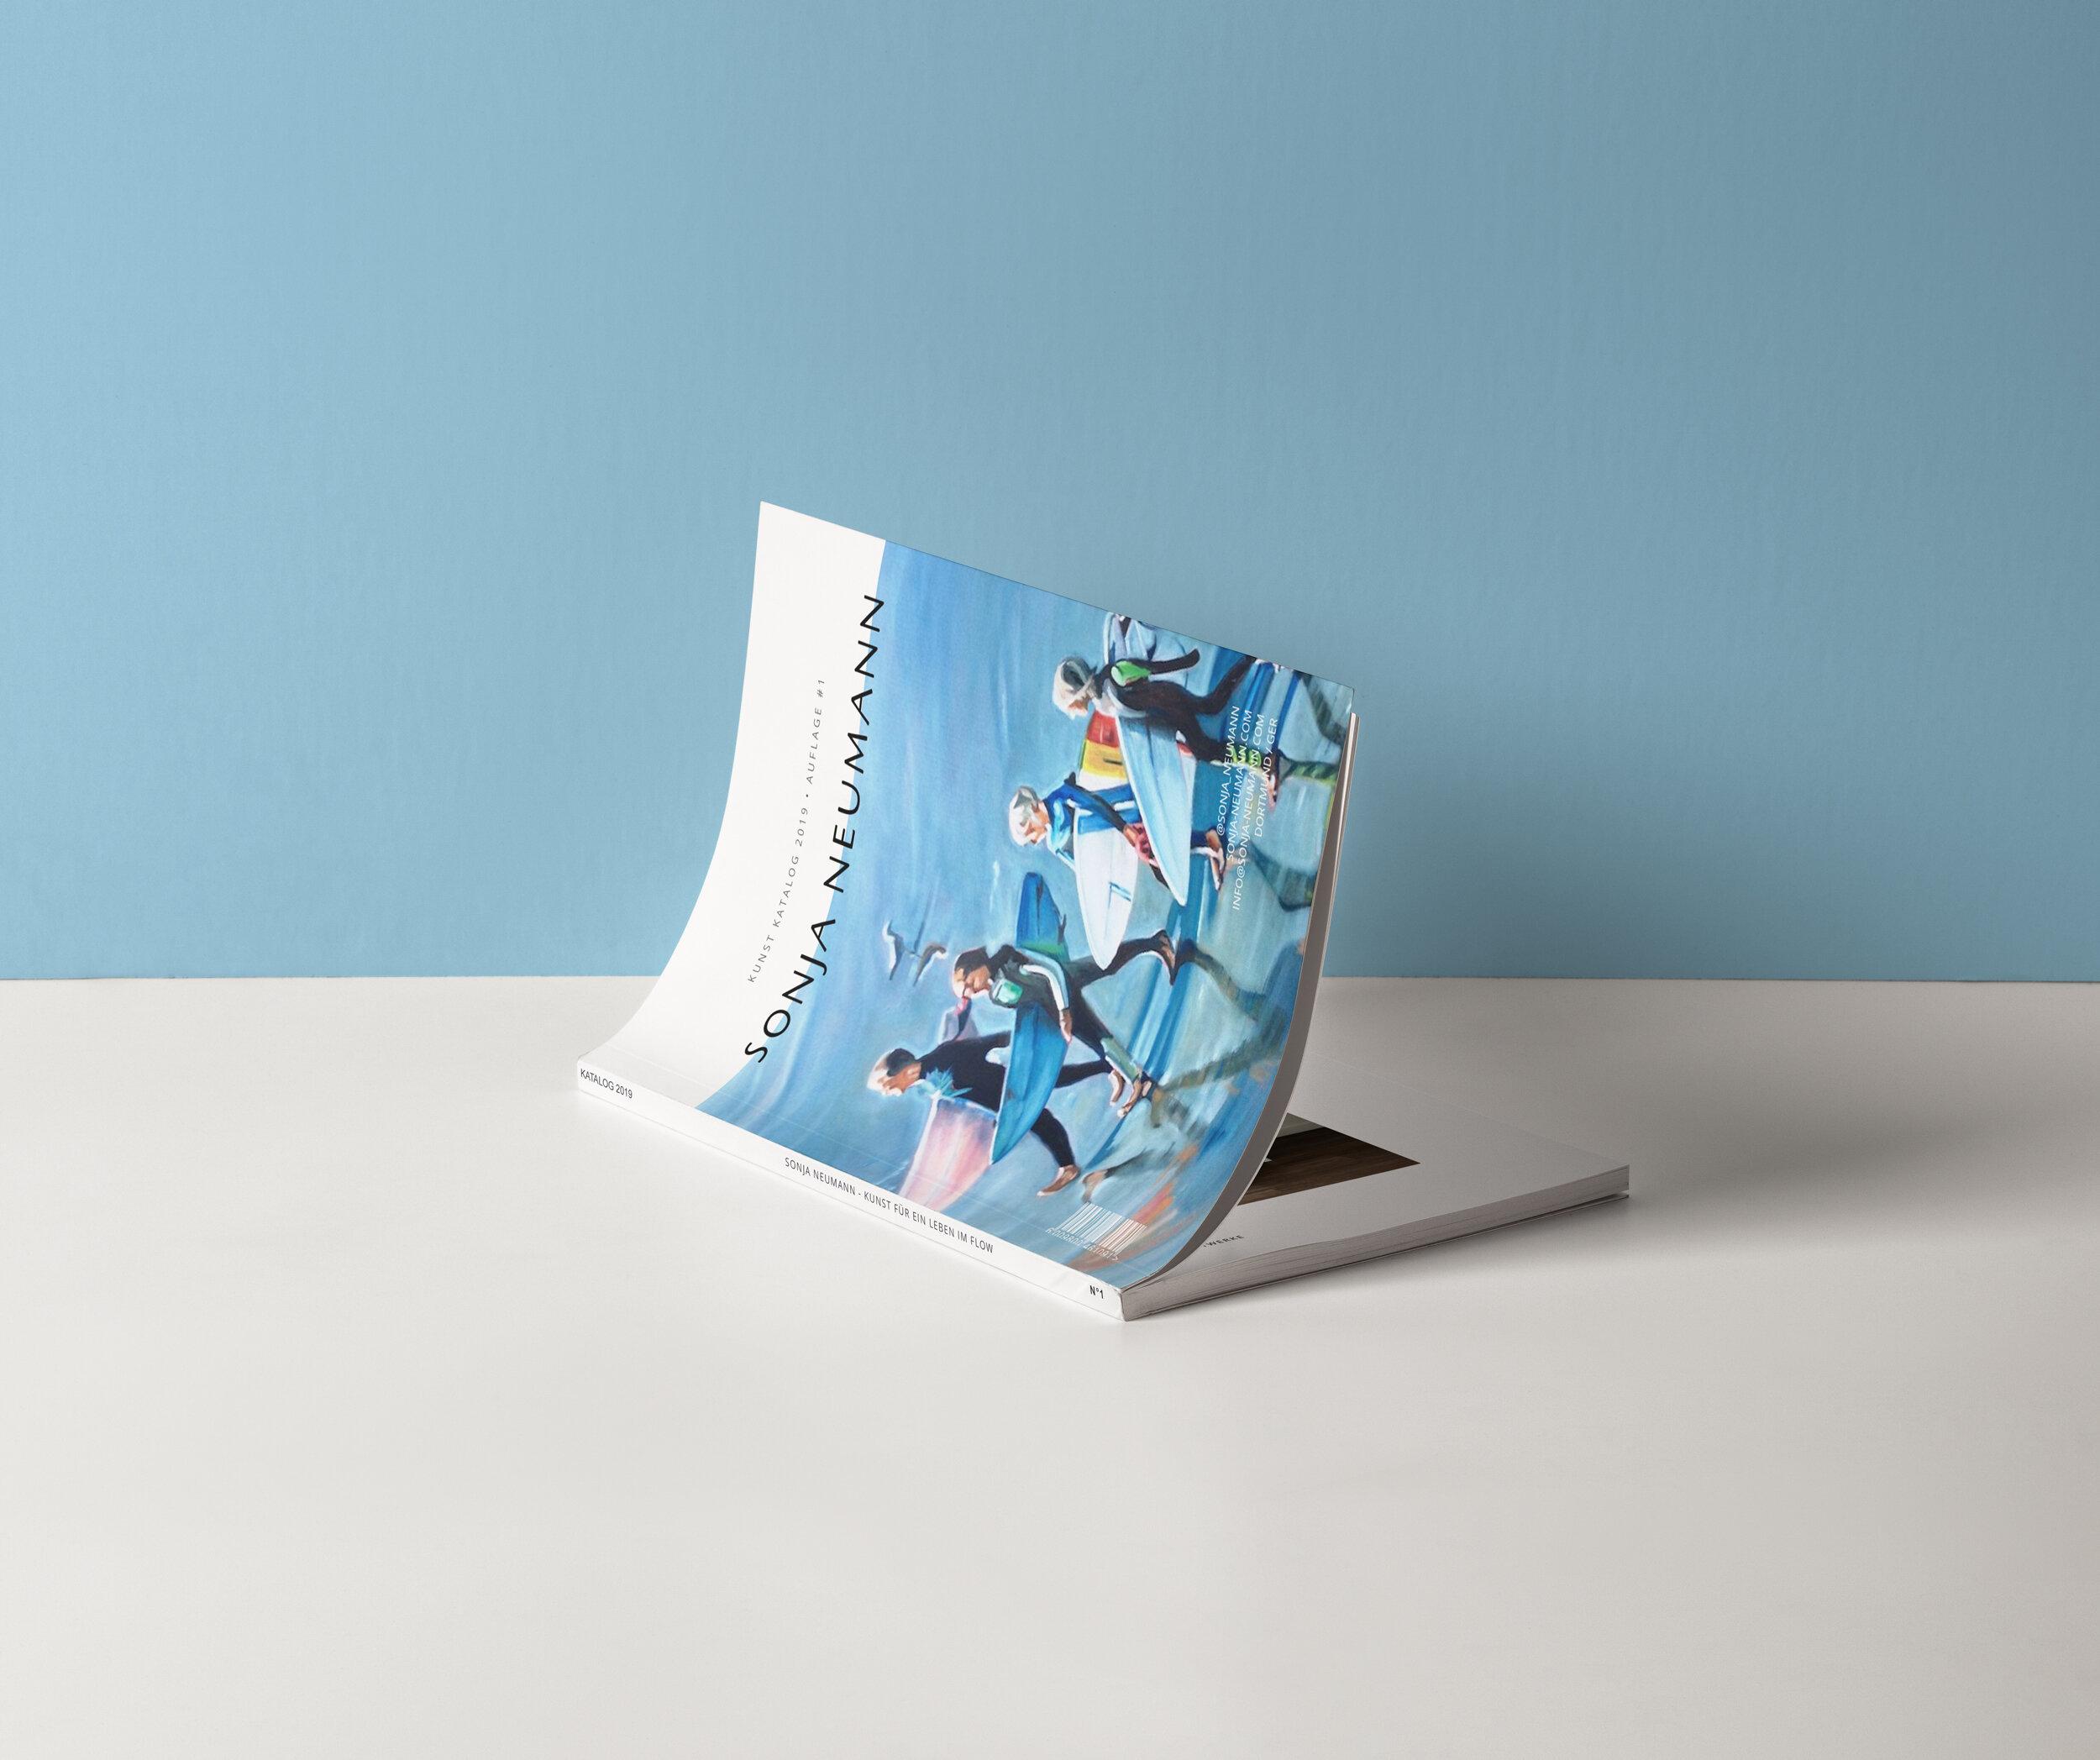 Heike-Köhler-Katalog-Mockup.jpg